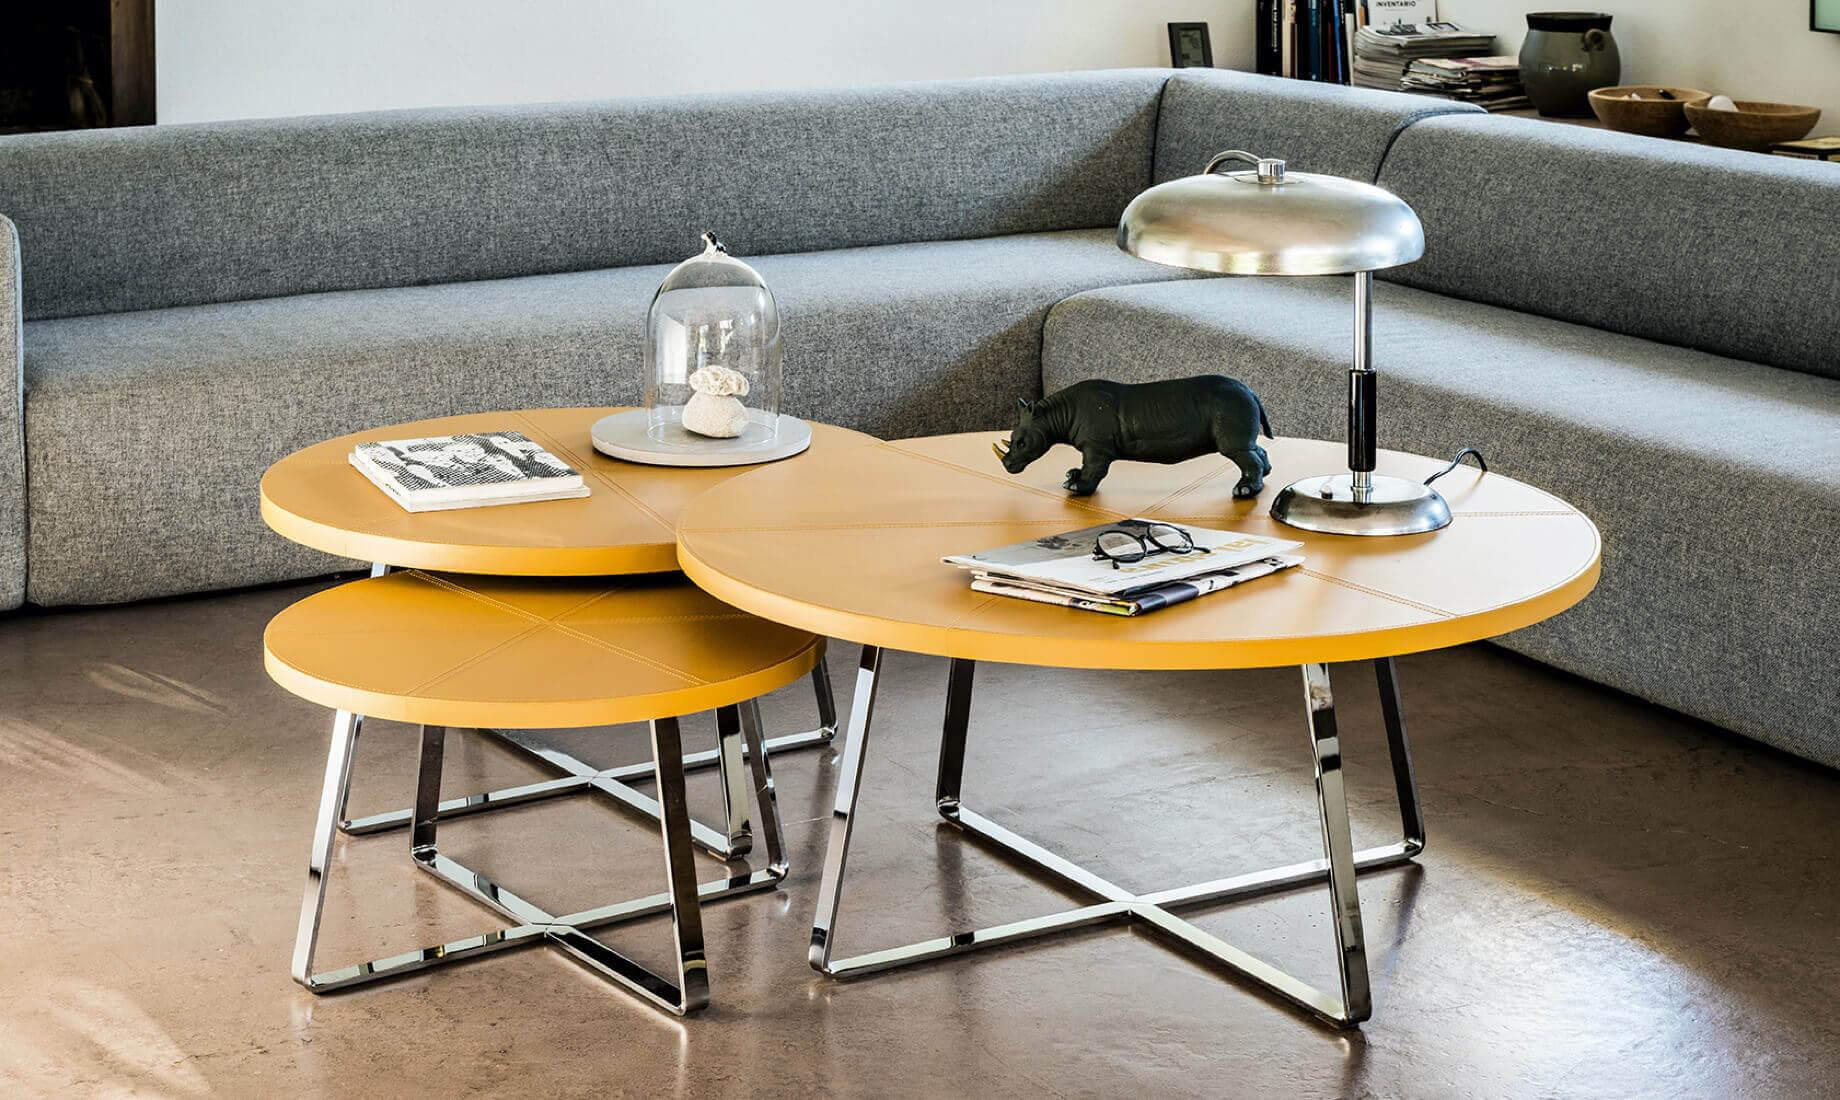 Midj - Pantone 2021 - Dj Coffee table